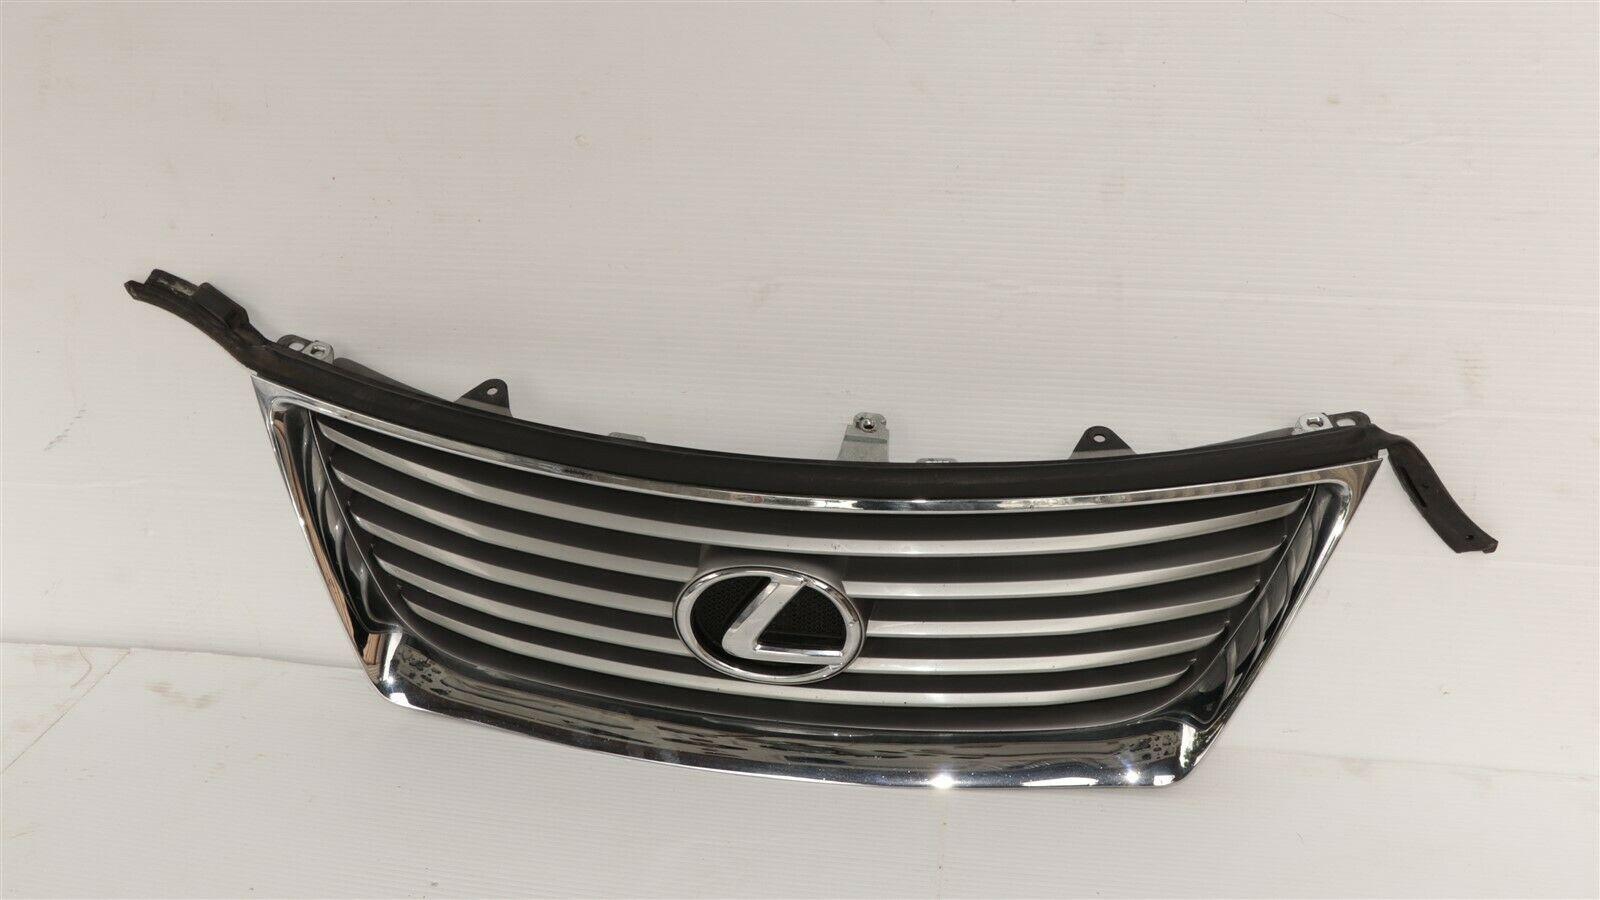 07-09 Lexus ES350 Upper Bumper Radiator Chrome Grill Grille W/Emblem